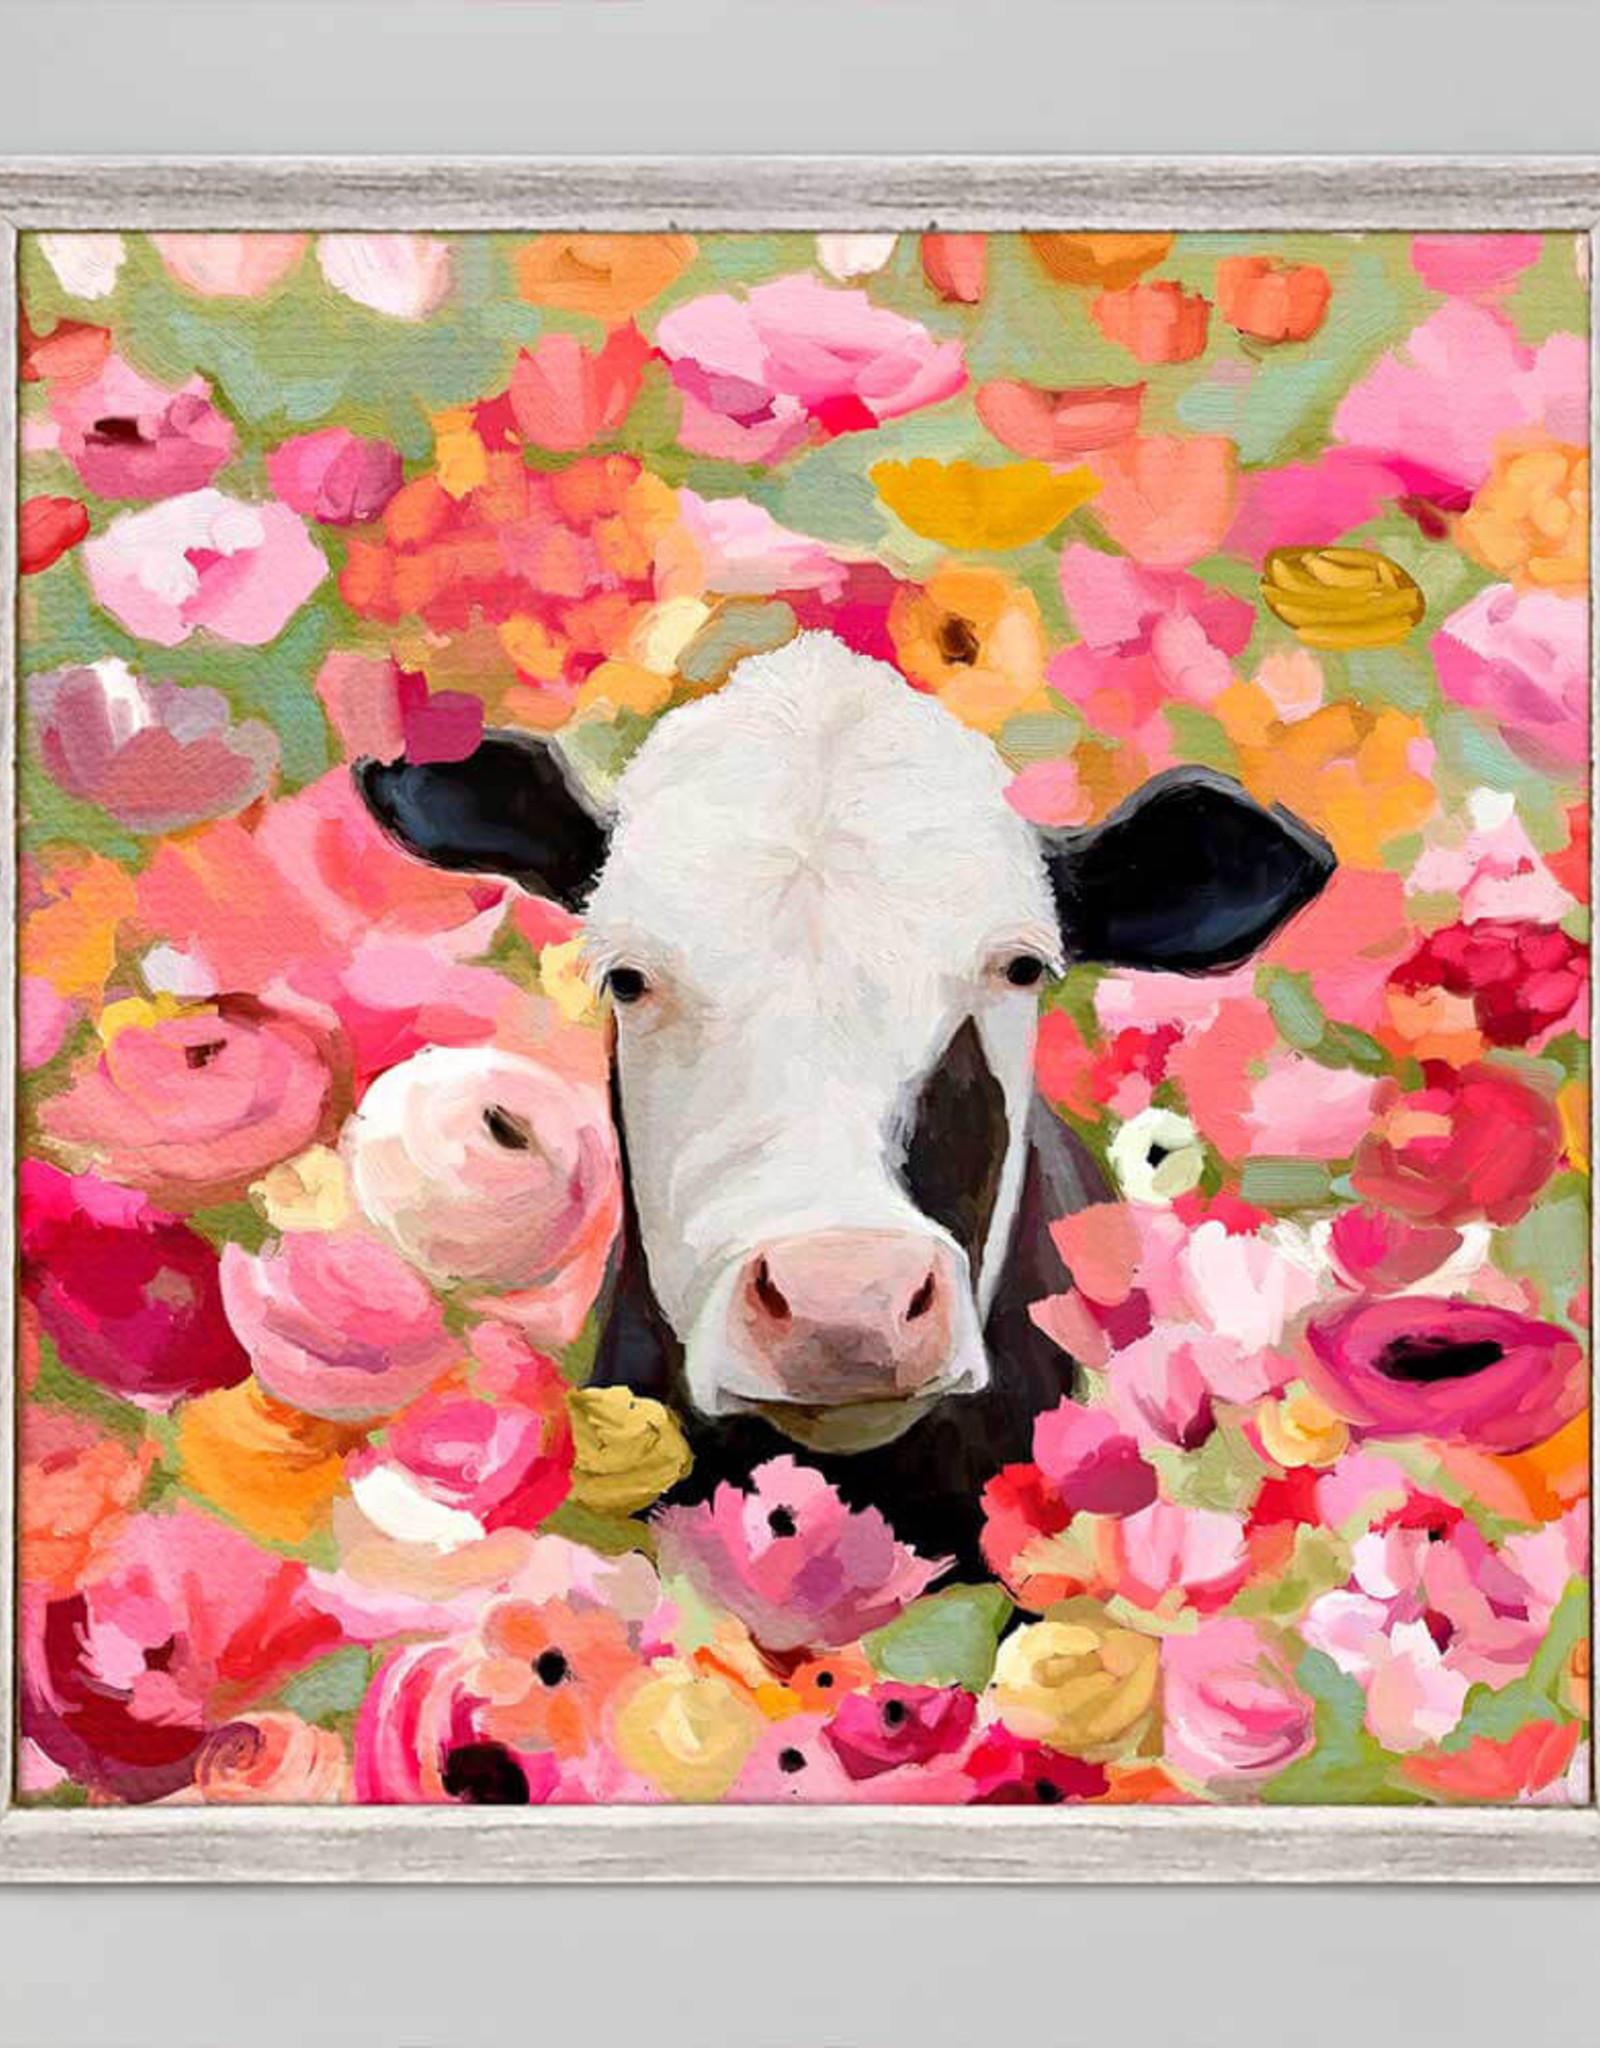 Greenbox Art Wildflower Cow Mini Framed Canvas 6 x 6